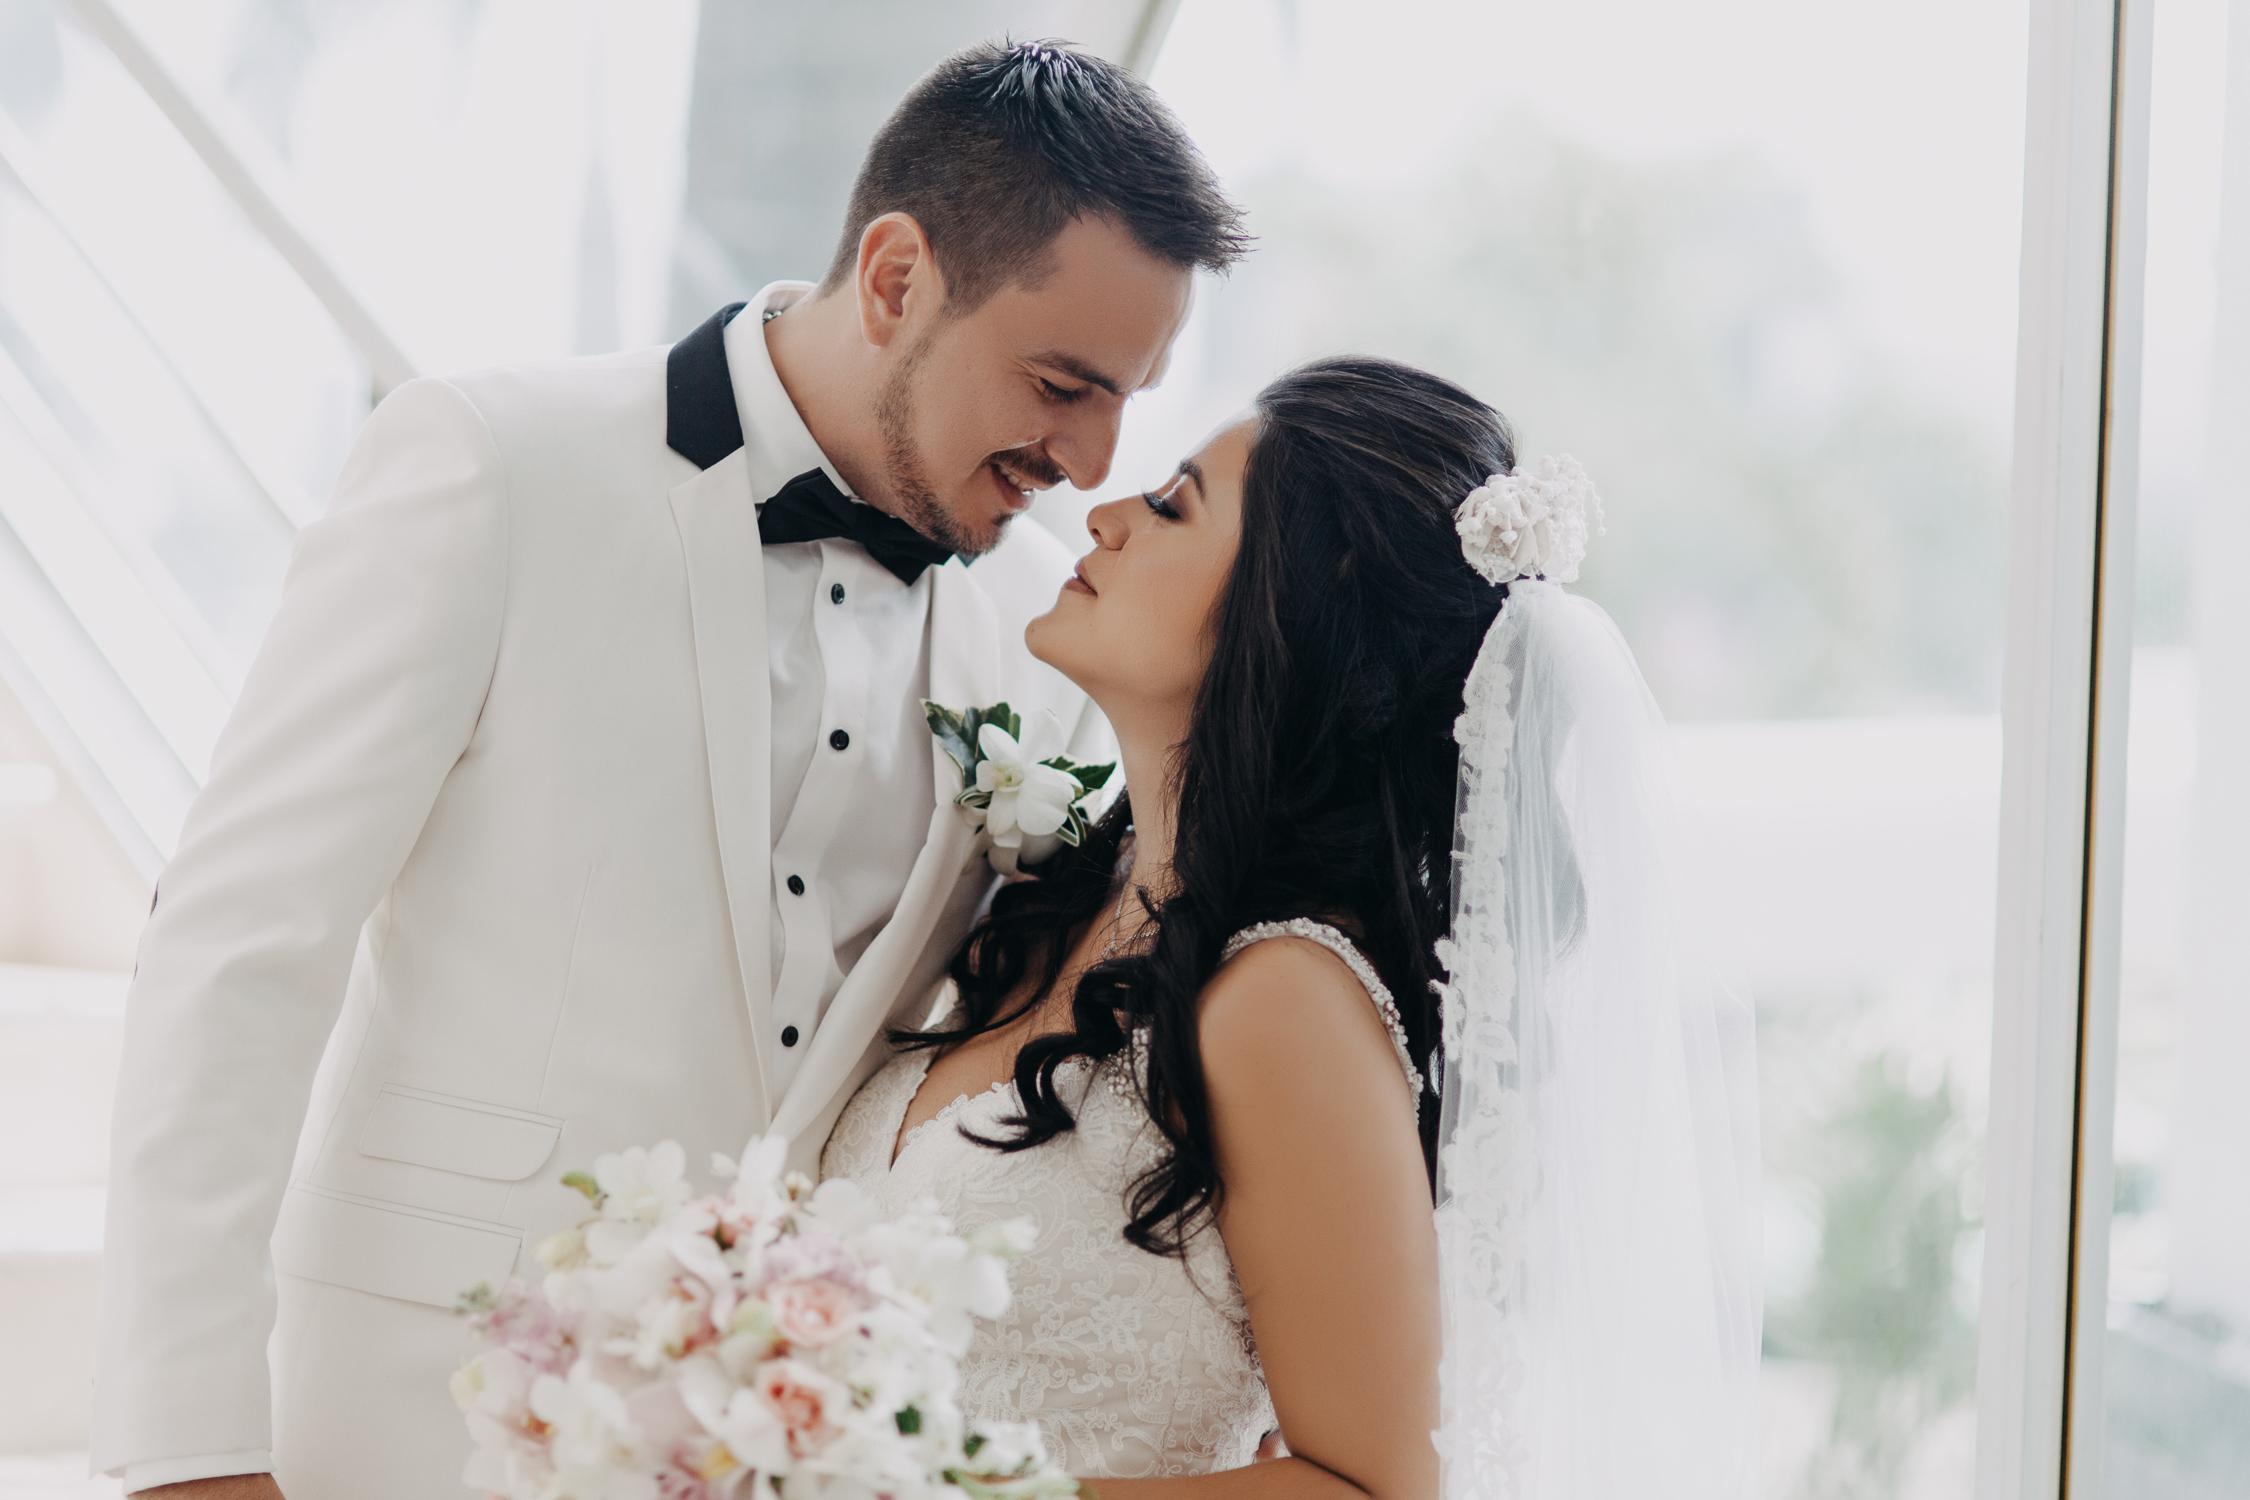 Michelle-Agurto-Fotografia-Bodas-Ecuador-Destination-Wedding-Photographer-Daniela-Dirk-27.JPG